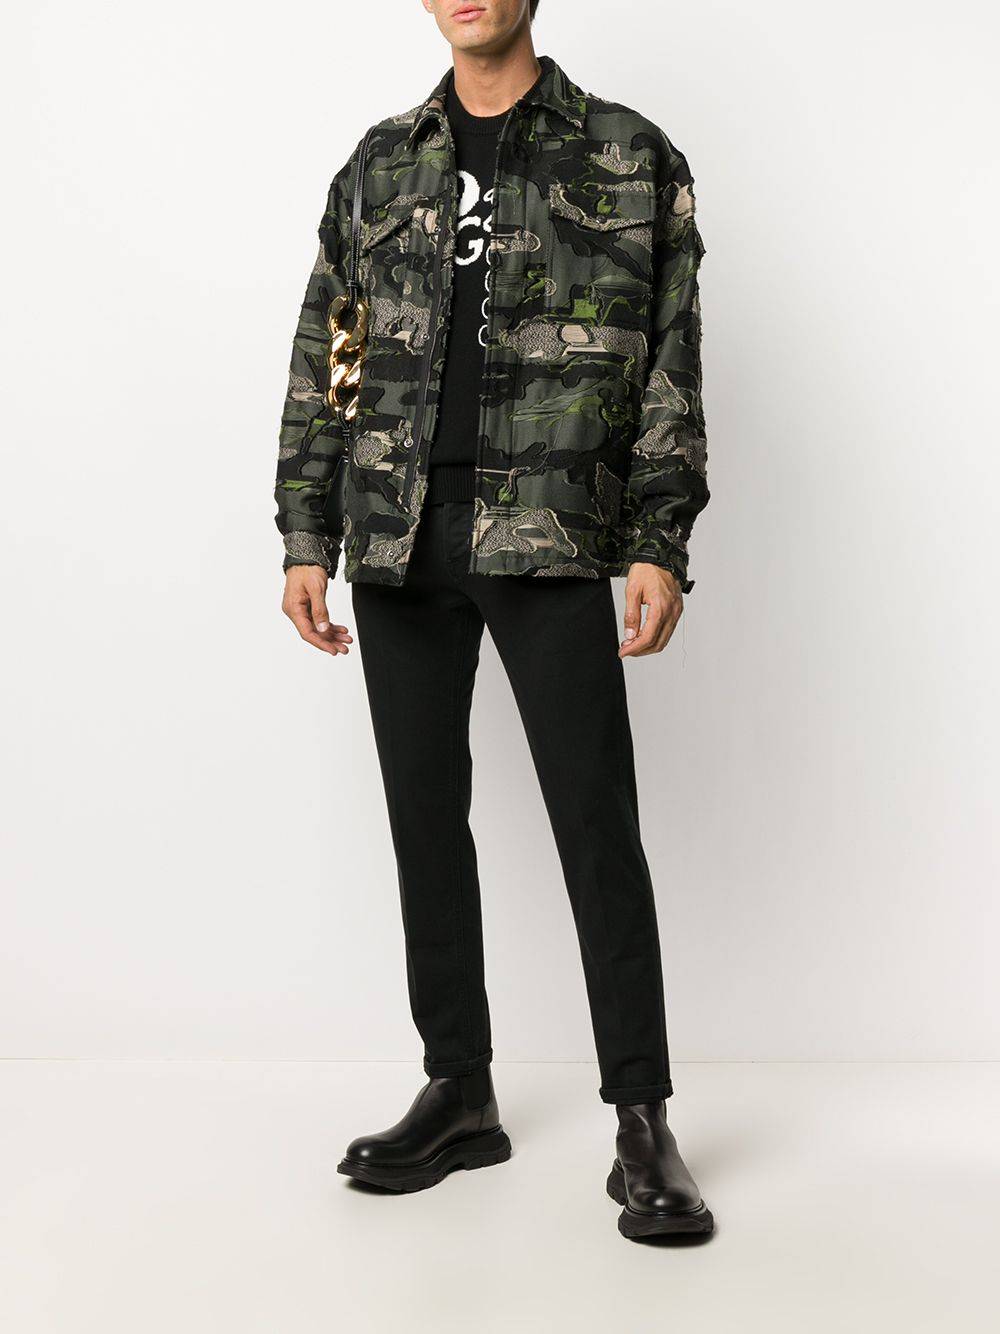 Black and white virgin wool-cashmere blend Dolce & Gabbana logo doodle jumper   DOLCE & GABBANA |  | GXA63Z-JAM3DS9000